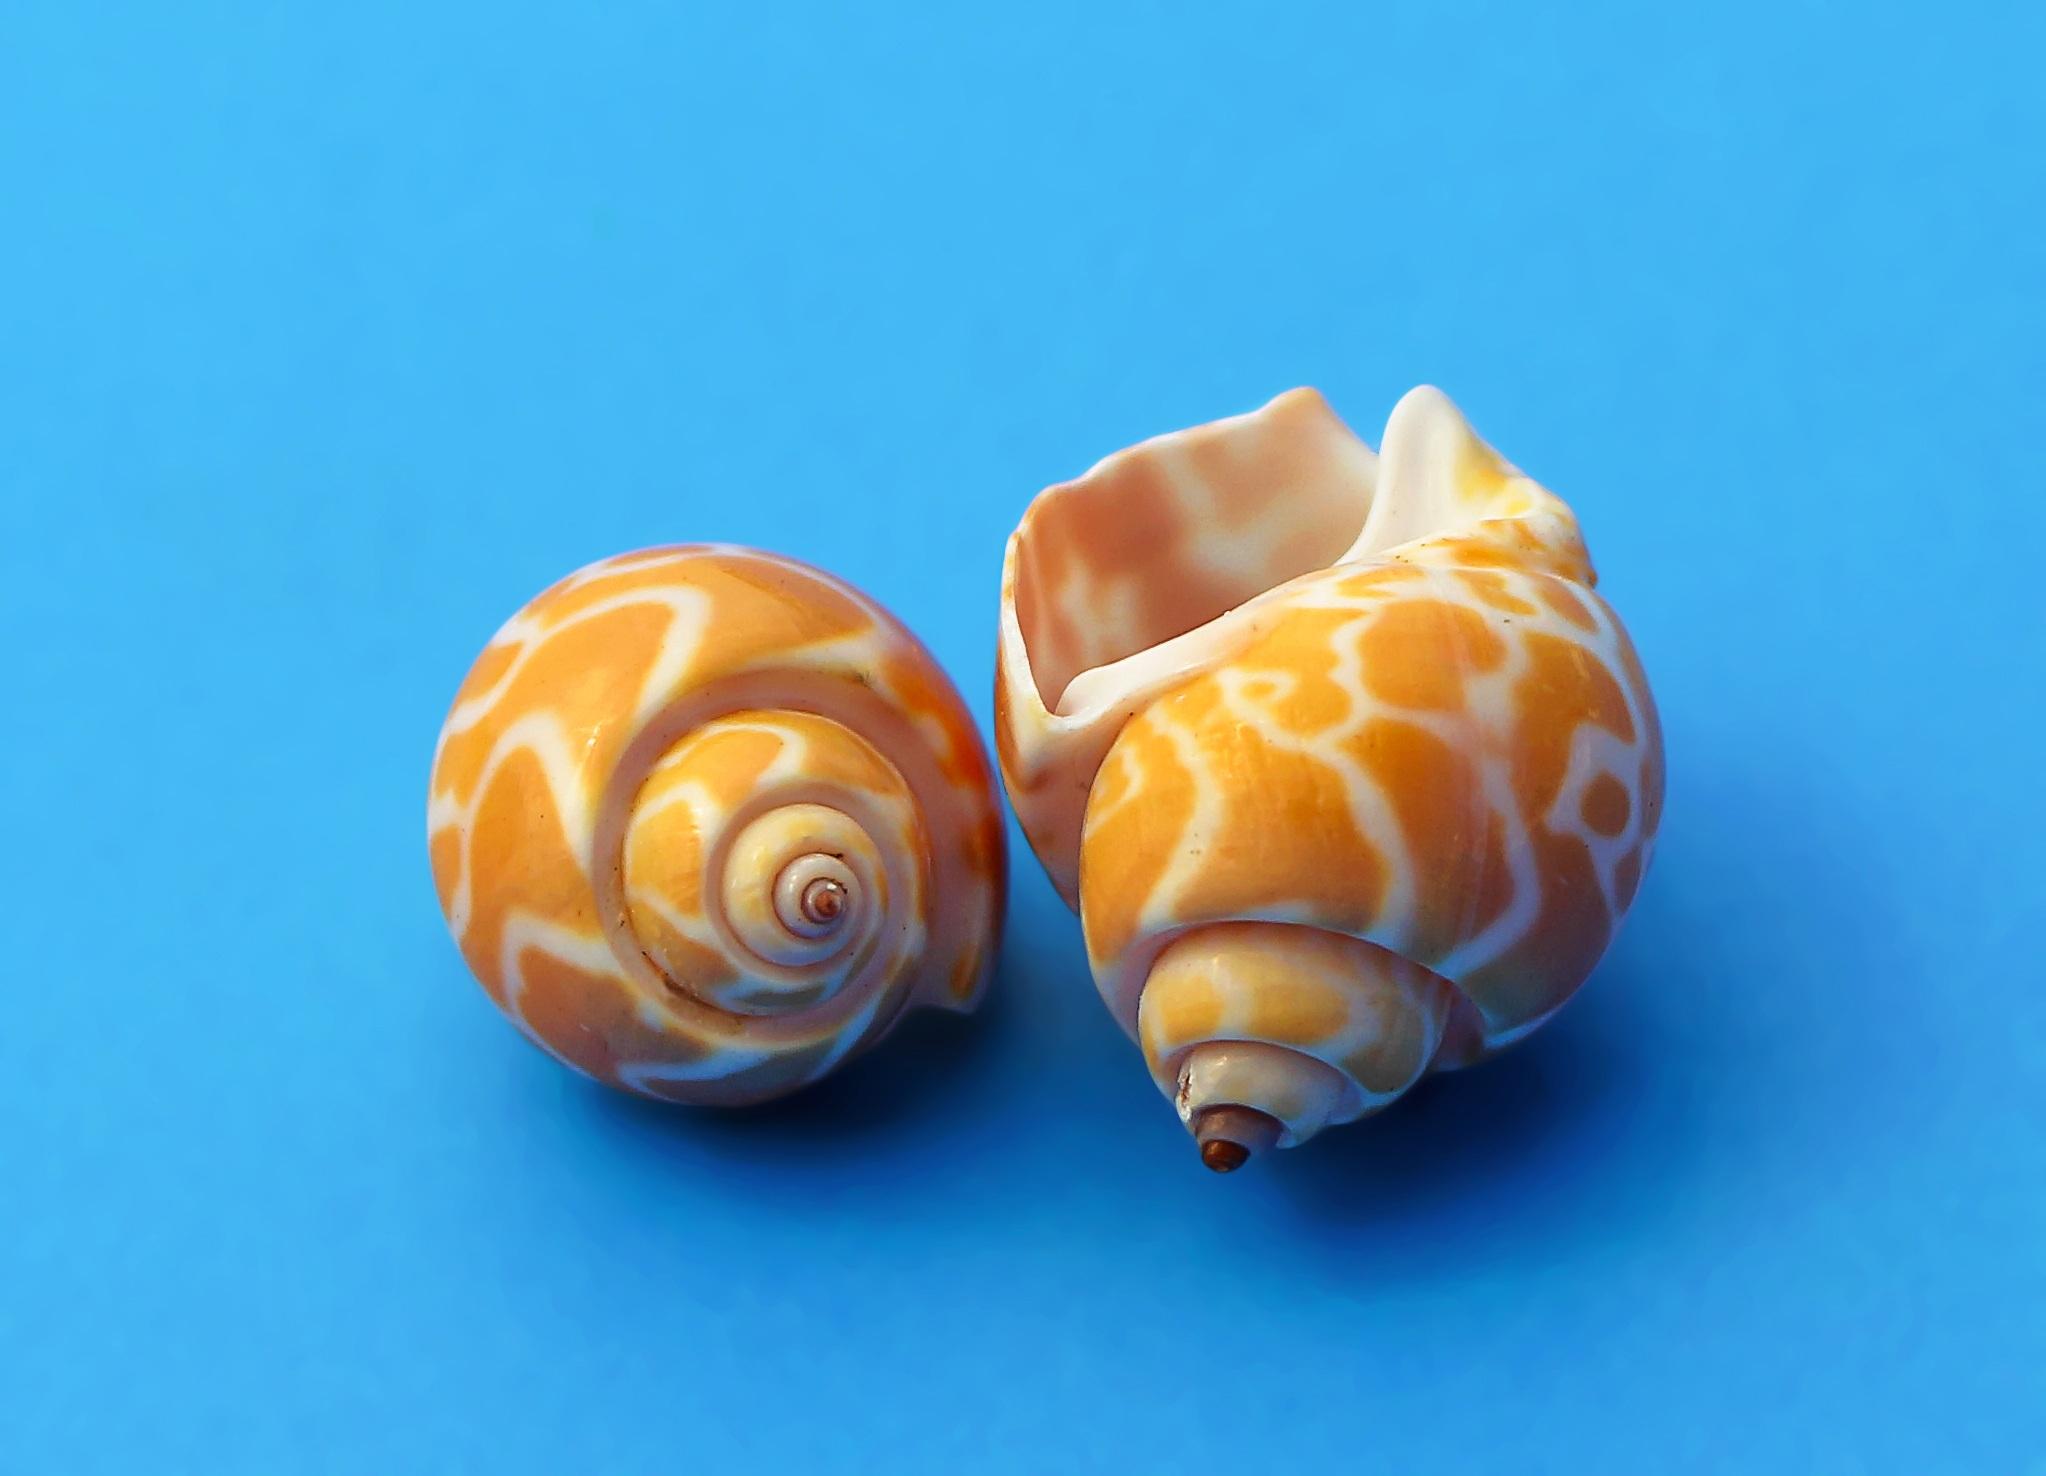 Gambar Alam Makanan Titisan Invertebrata Kerang Laut Kulit